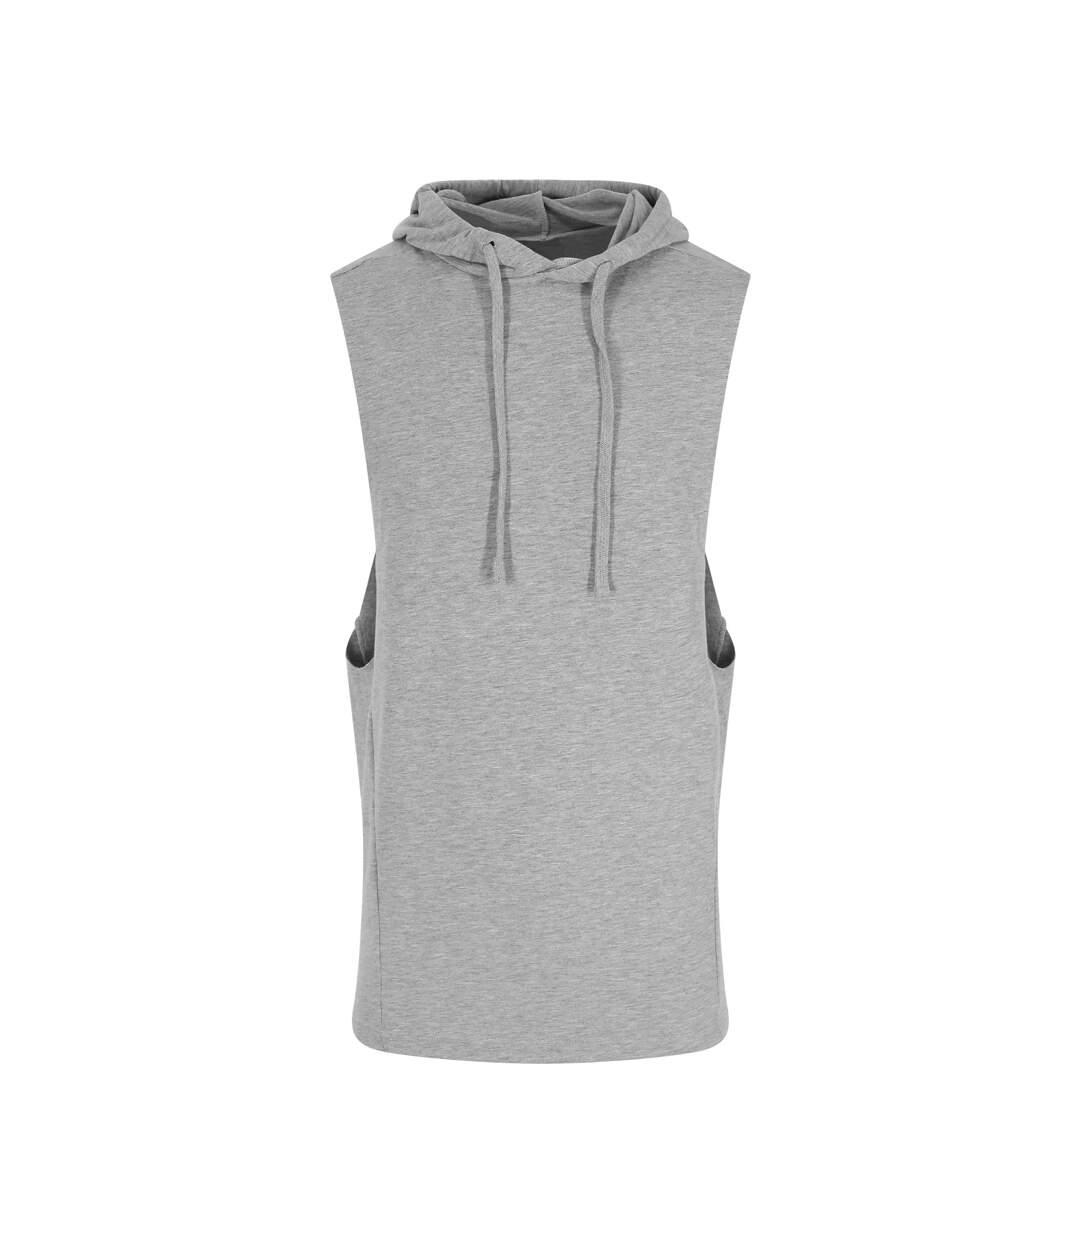 AWDis Adults Unisex Just Cool Urban Sleeveless Muscle Hoodie (Sport Grey) - UTPC3902